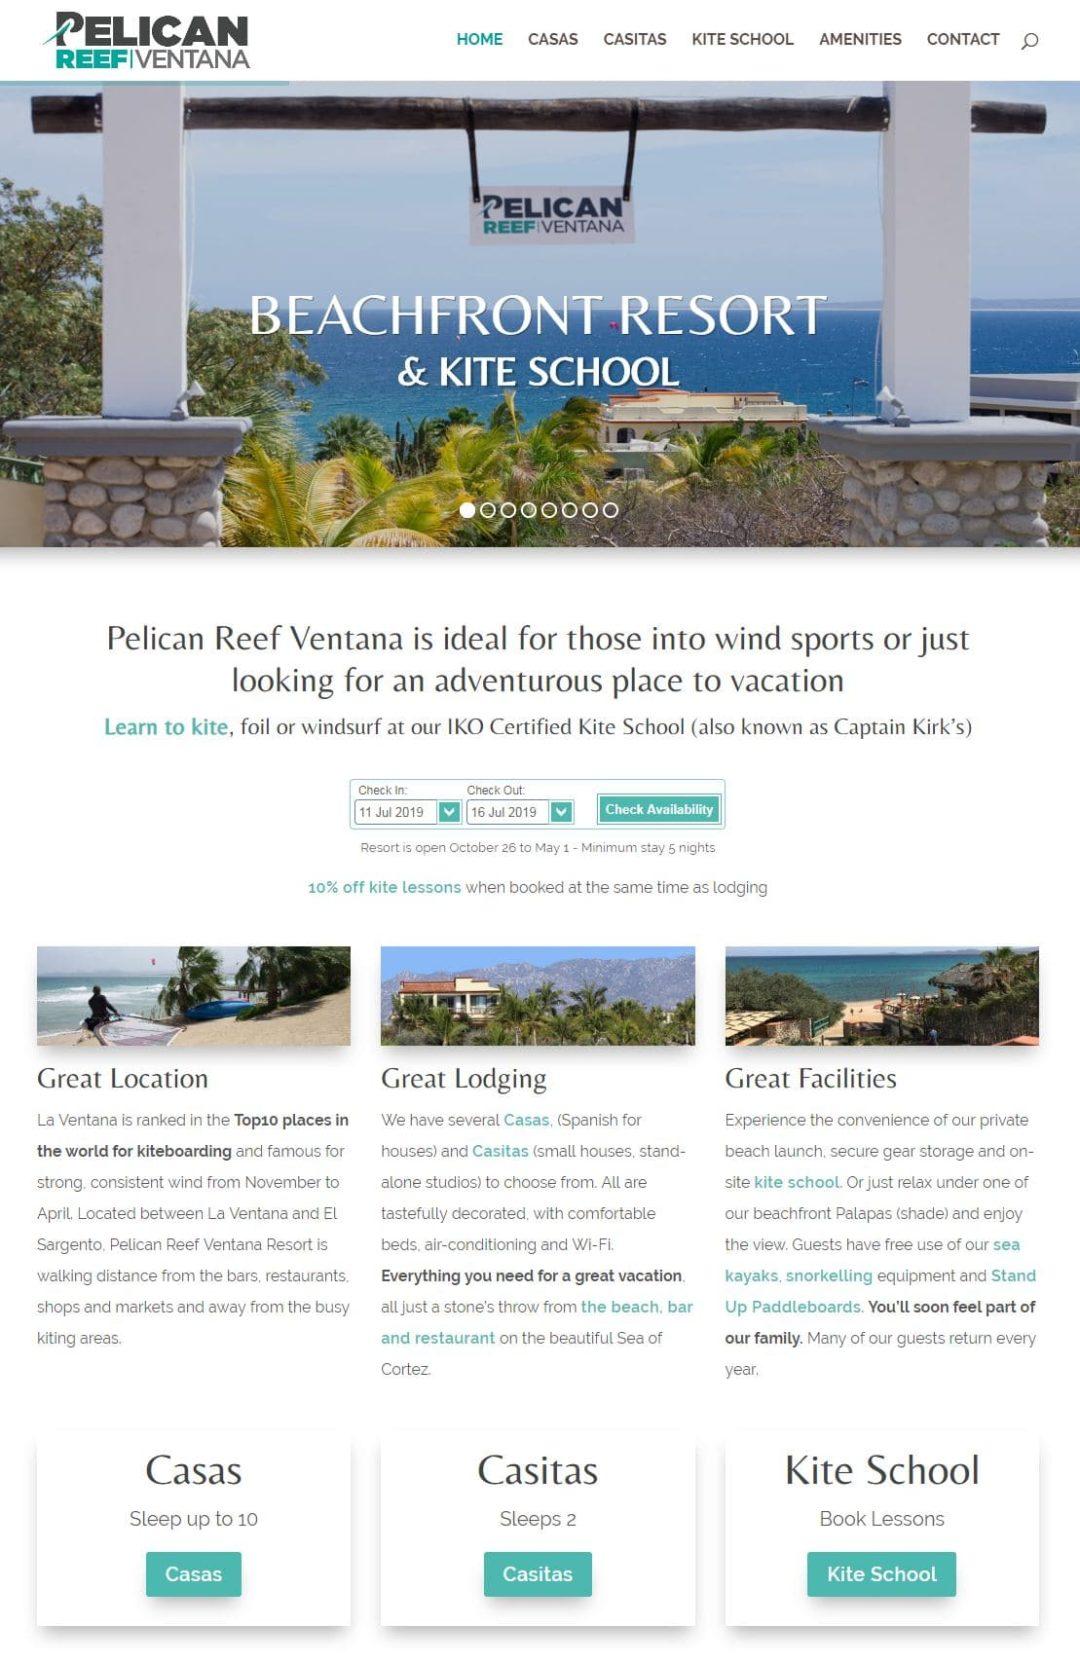 Pelican Reef Ventana